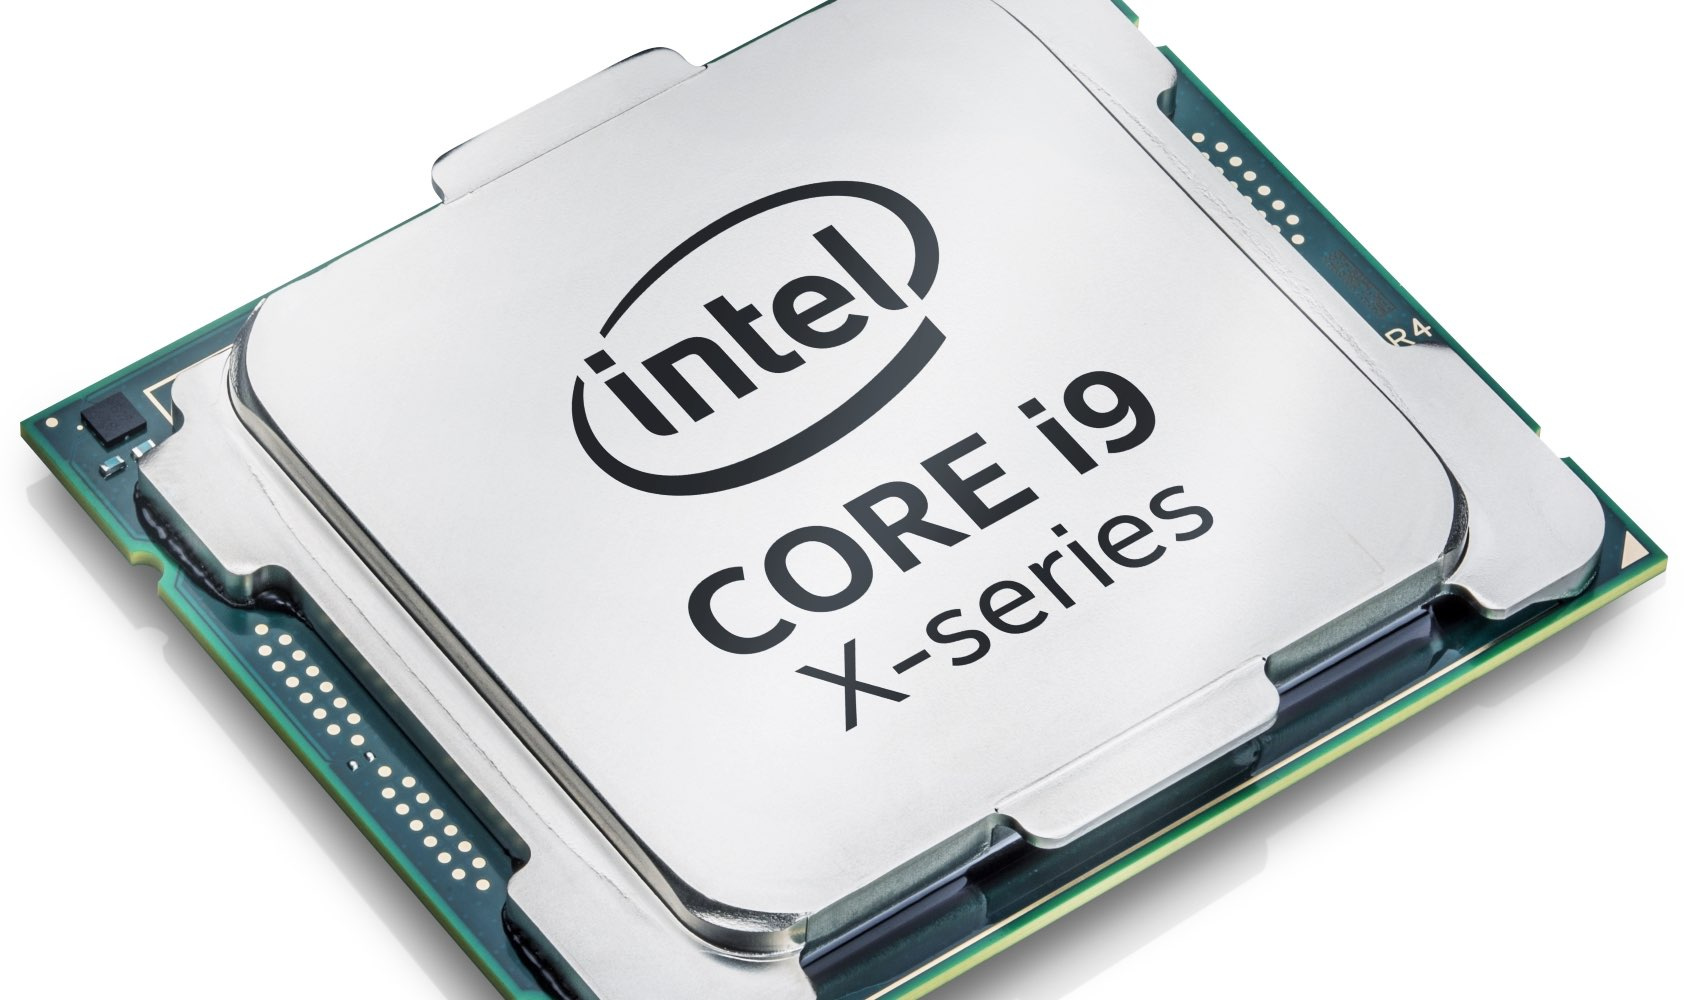 Trending: Intel Core X I9 Processor Includes 18 Cores, 32 Threads